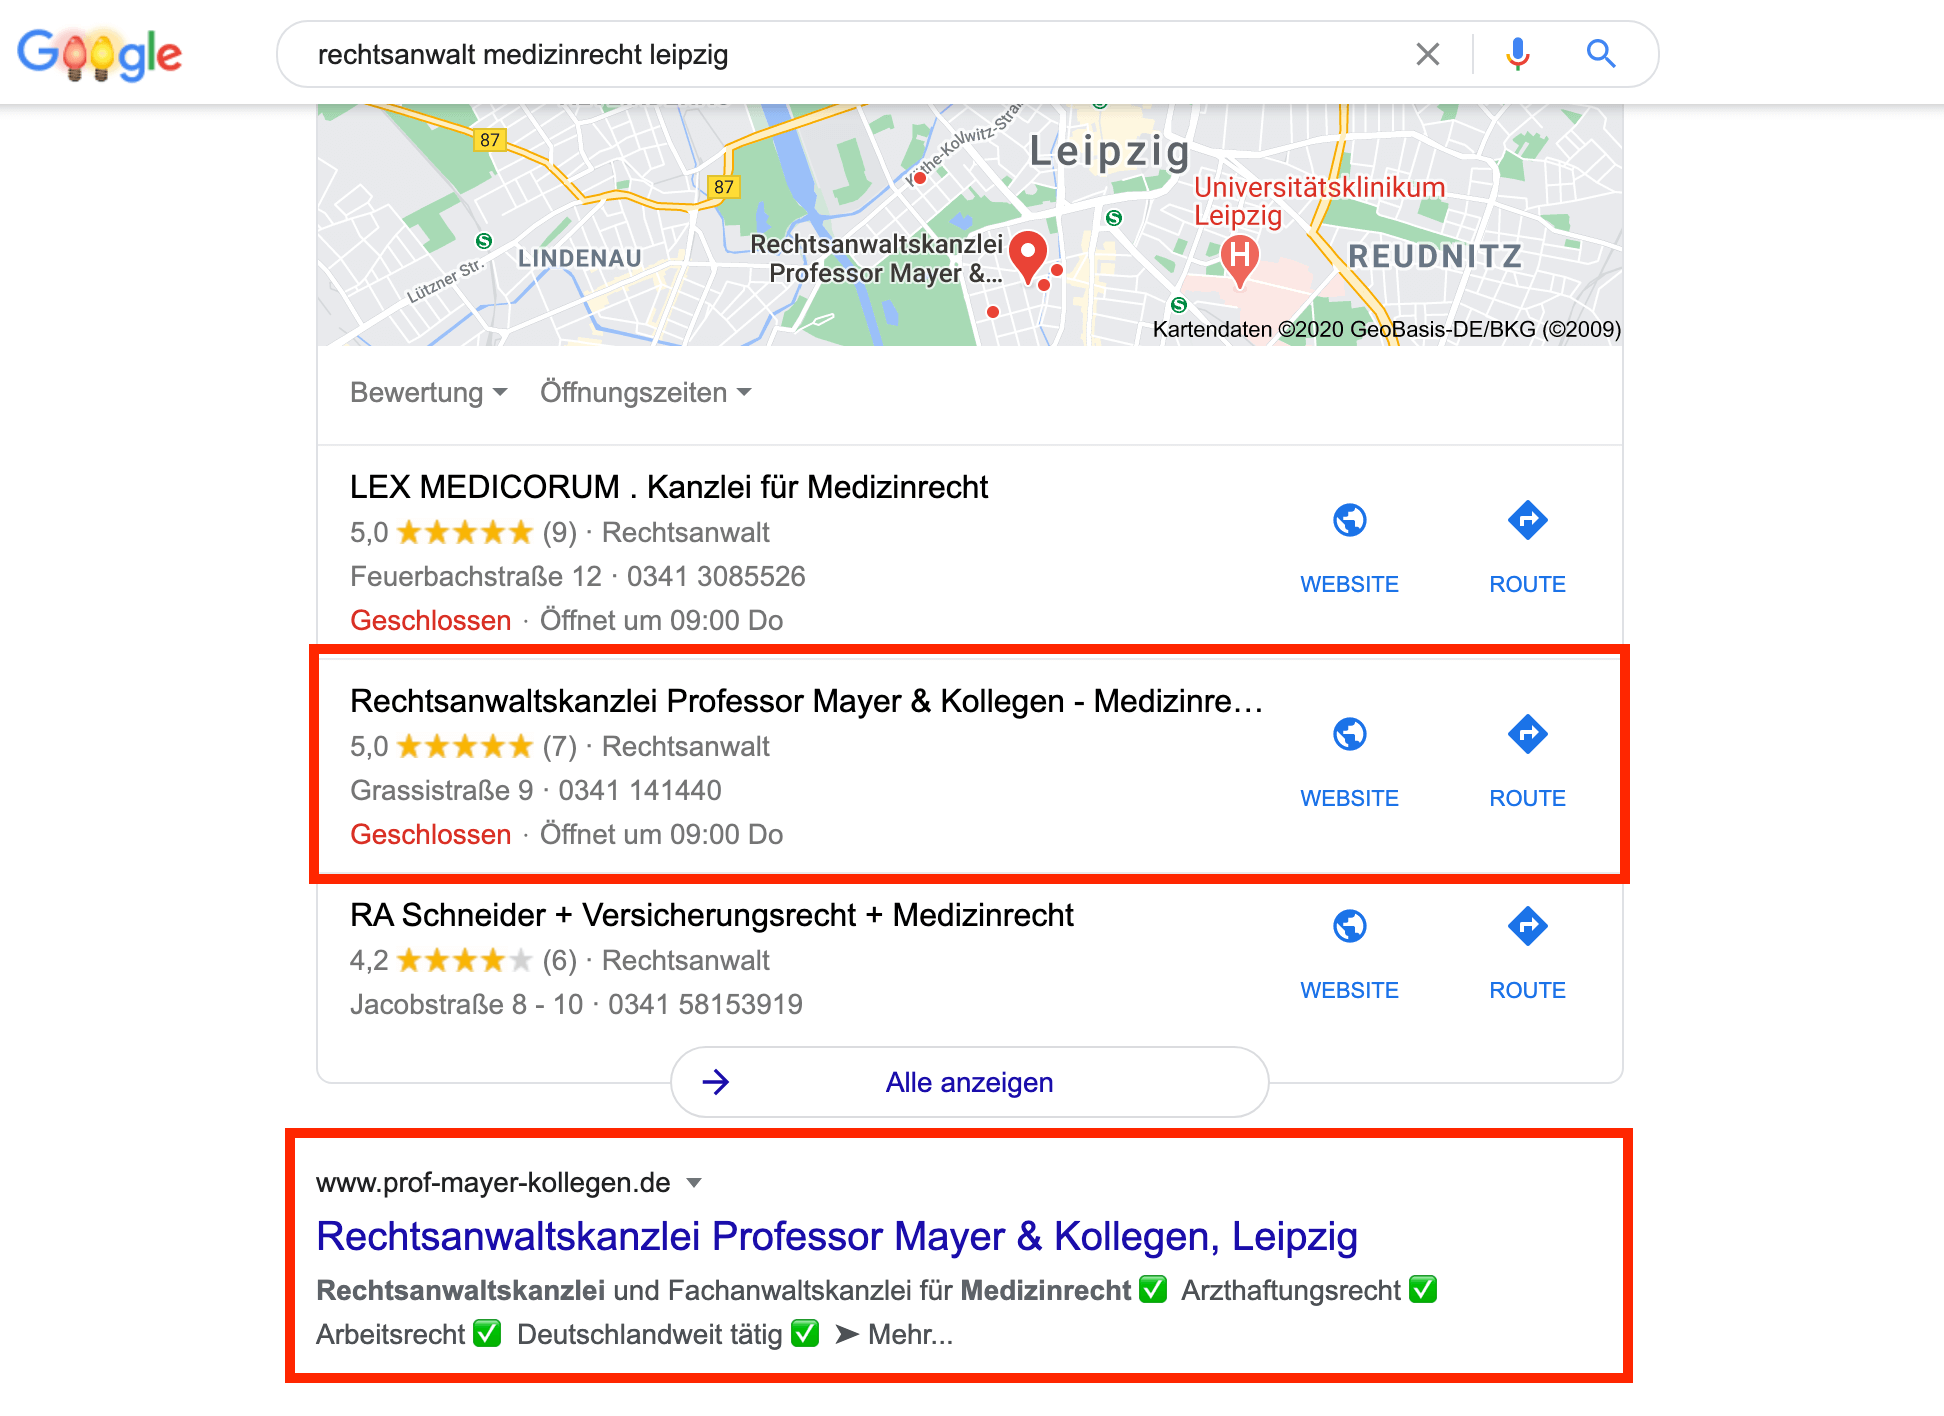 Google-Suchergebnis Rechtsanwälte Professor Mayer & Kollegen